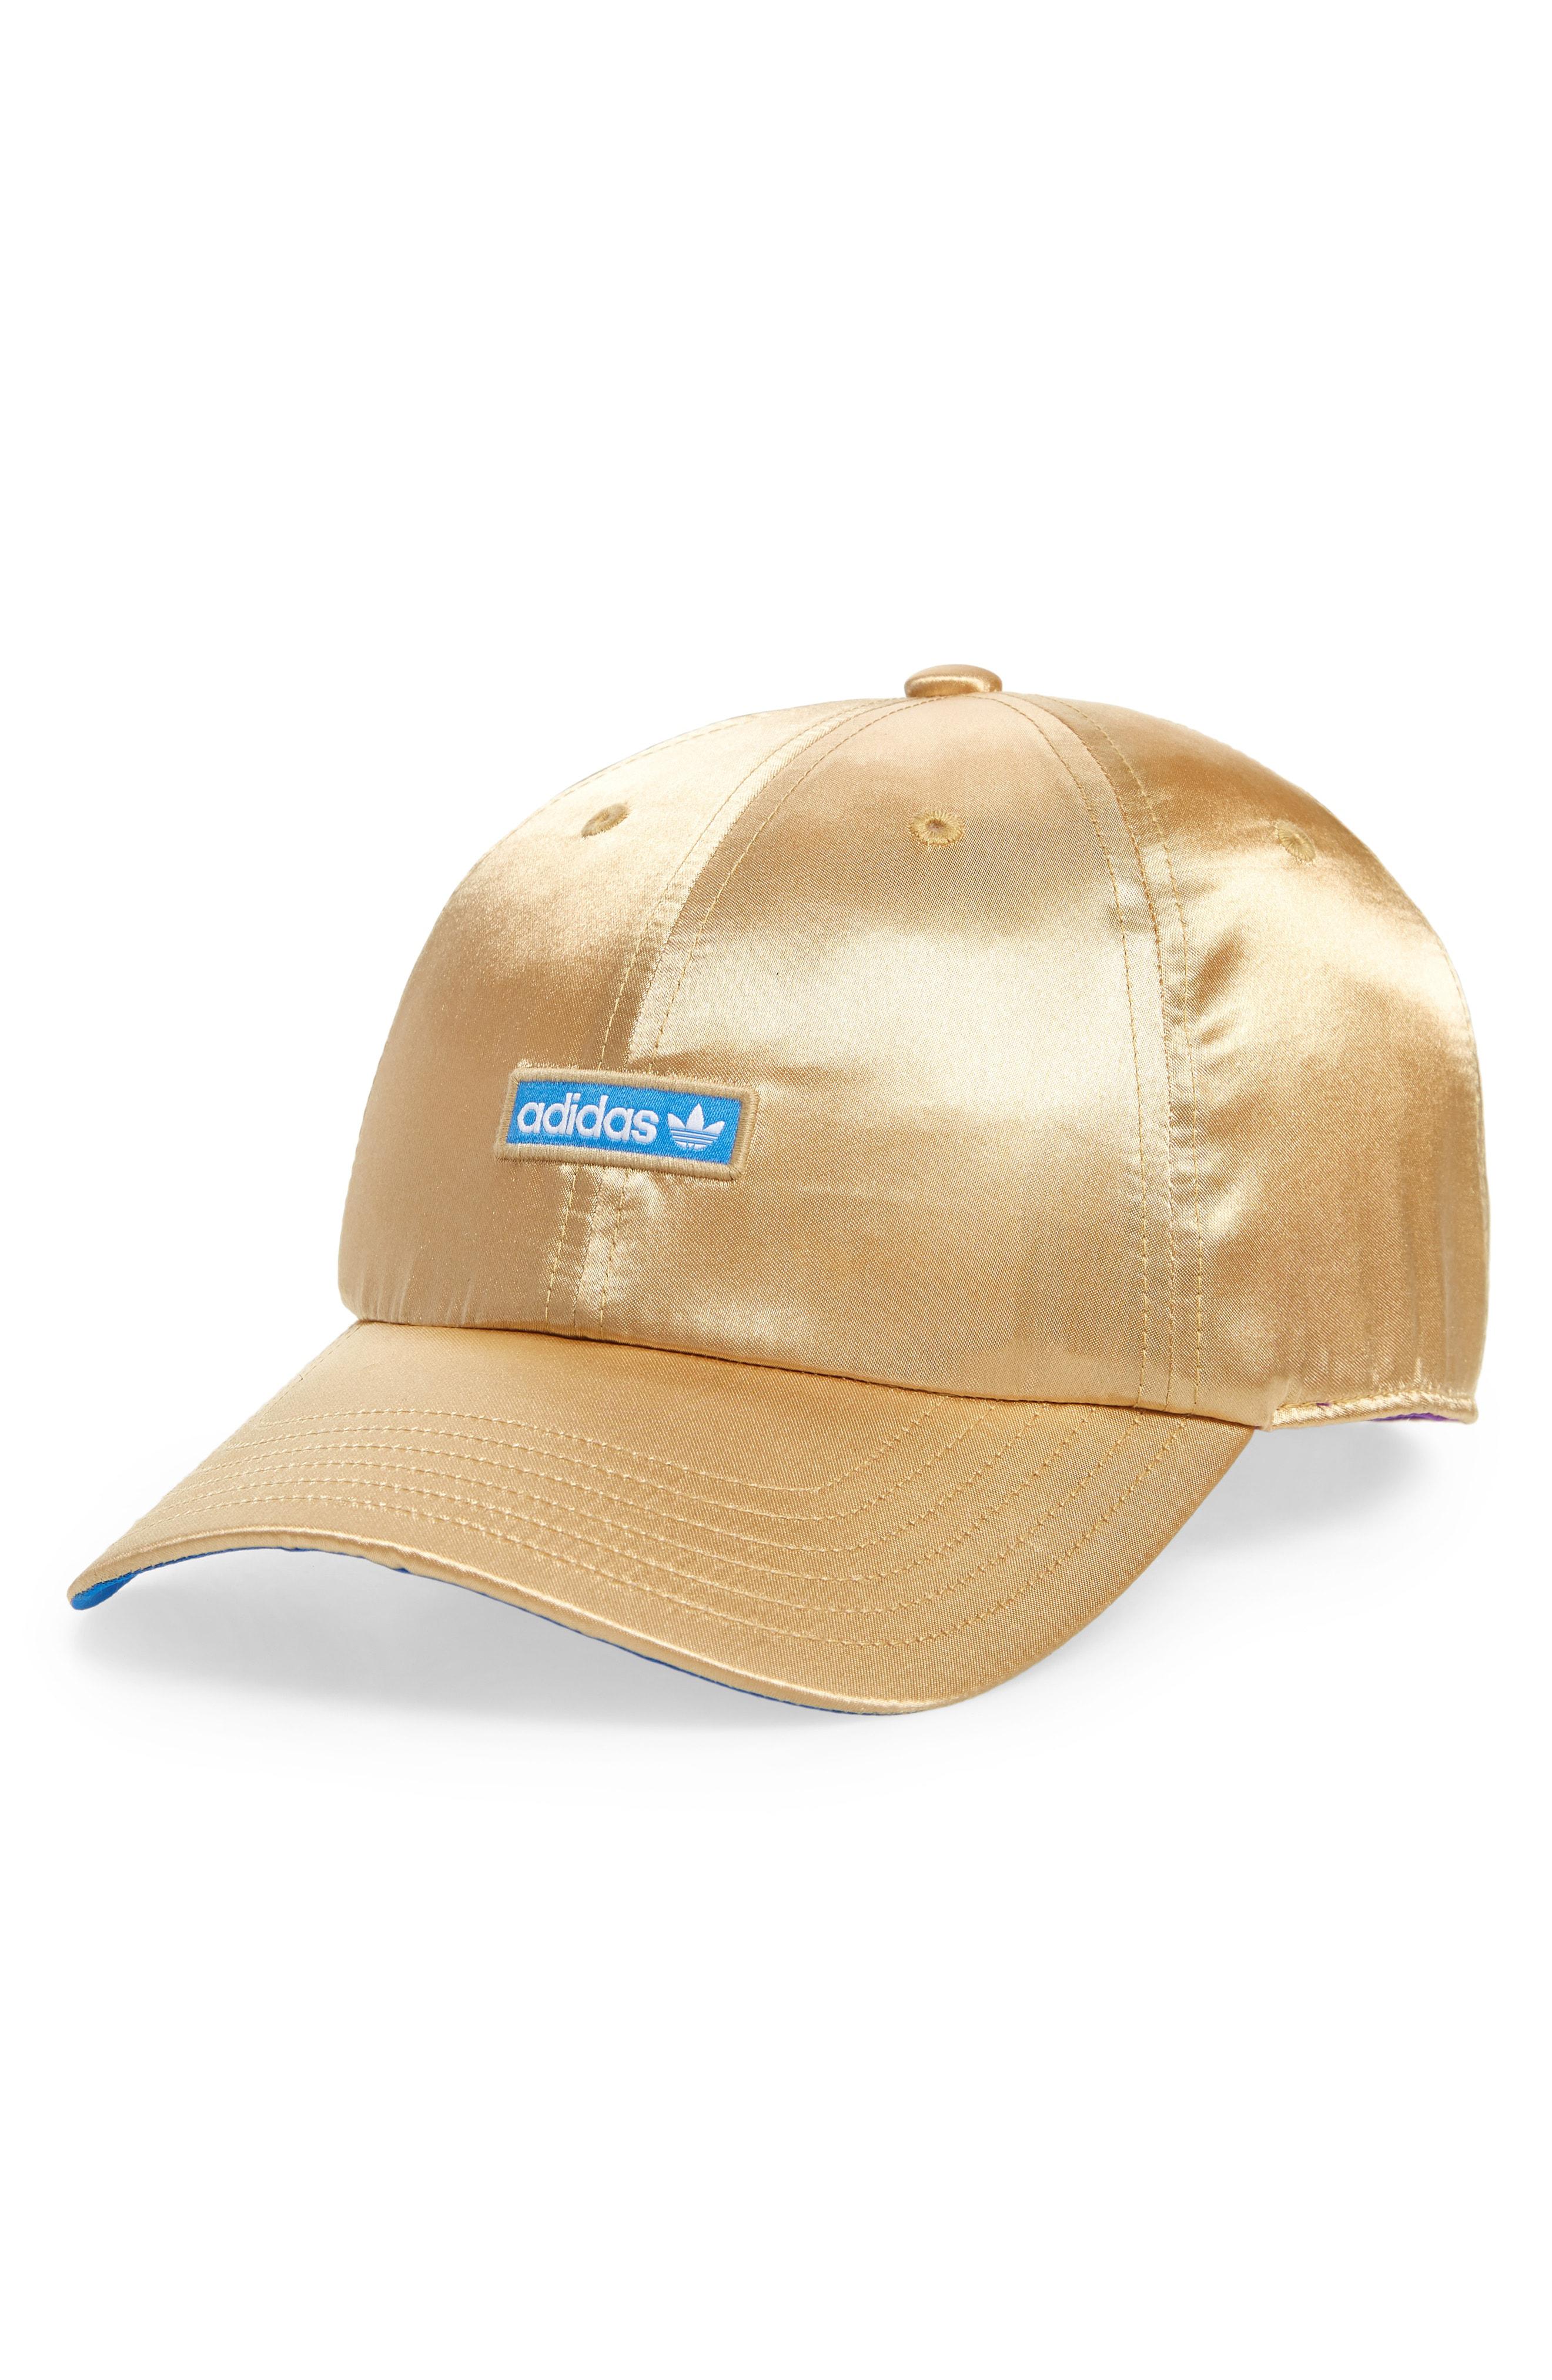 53cd982a92c Adidas Originals Originals Metallic Relaxed Strap Back Hat - Metallic In  Gold  True Blue